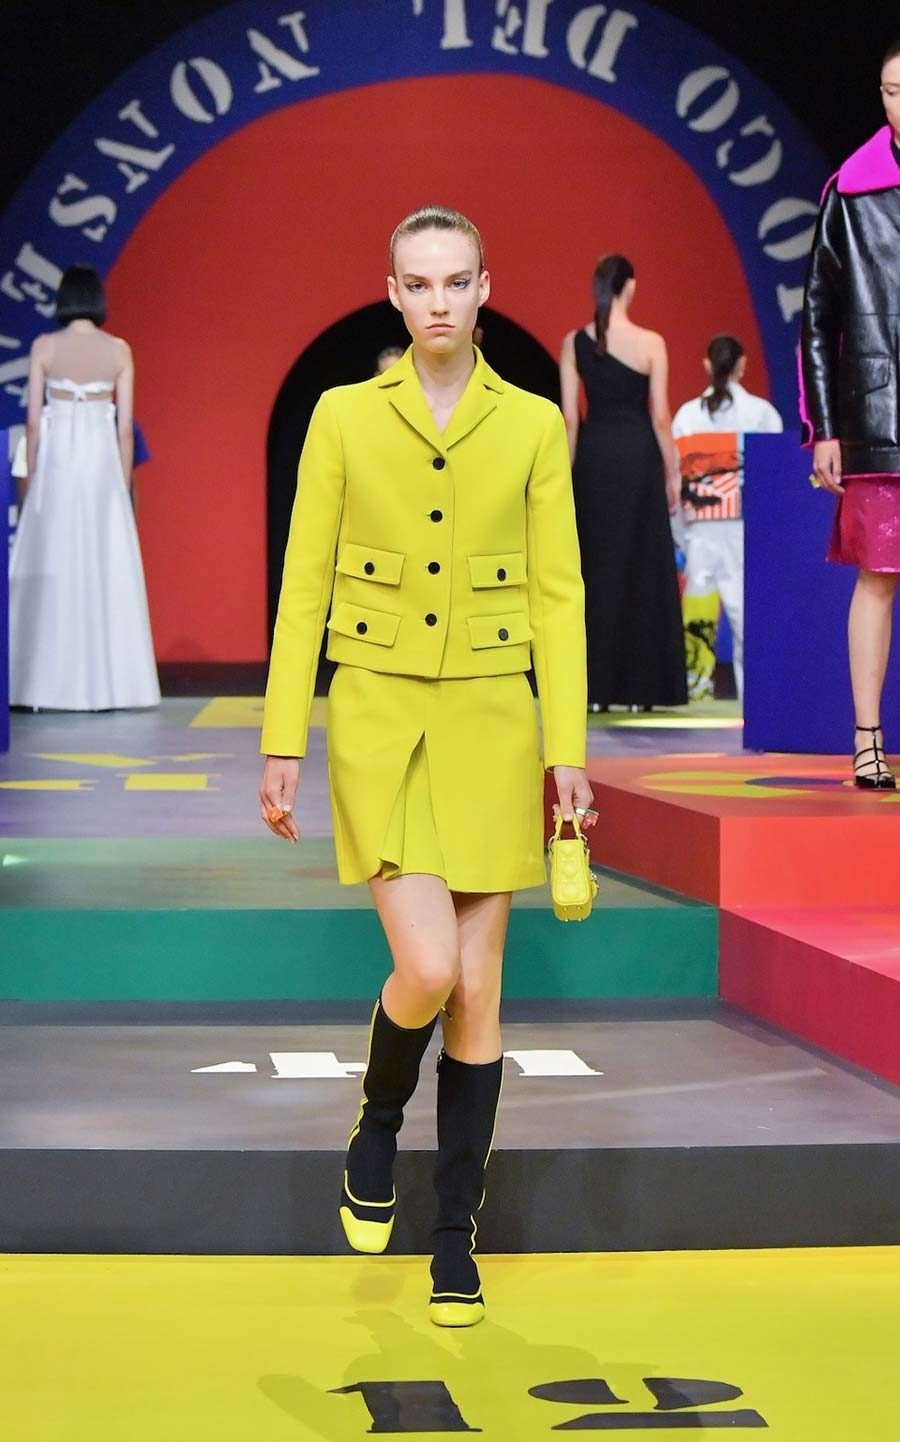 Paris fashion week mini skirt 2021